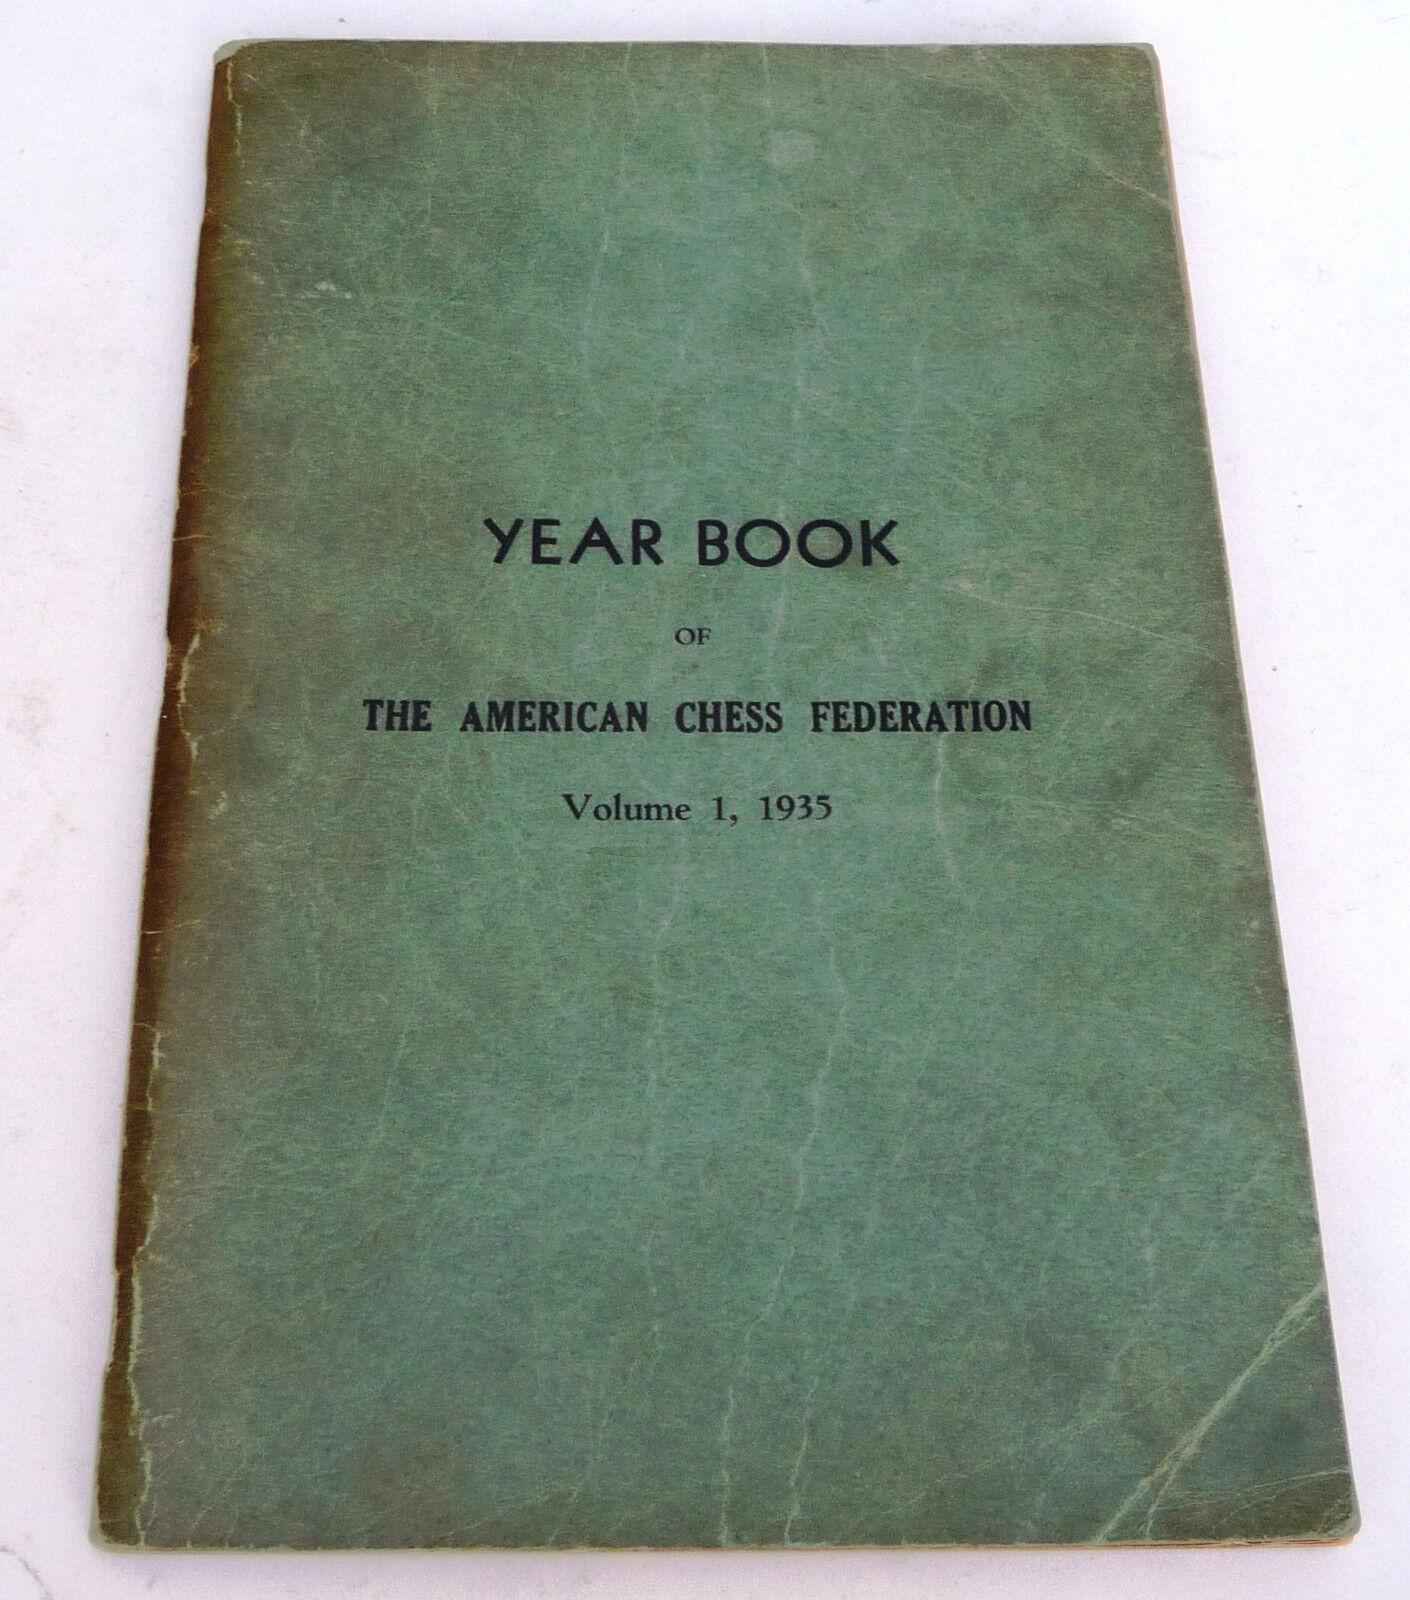 1935-American Chess Federation Yearbok skriven av Arpad Elo